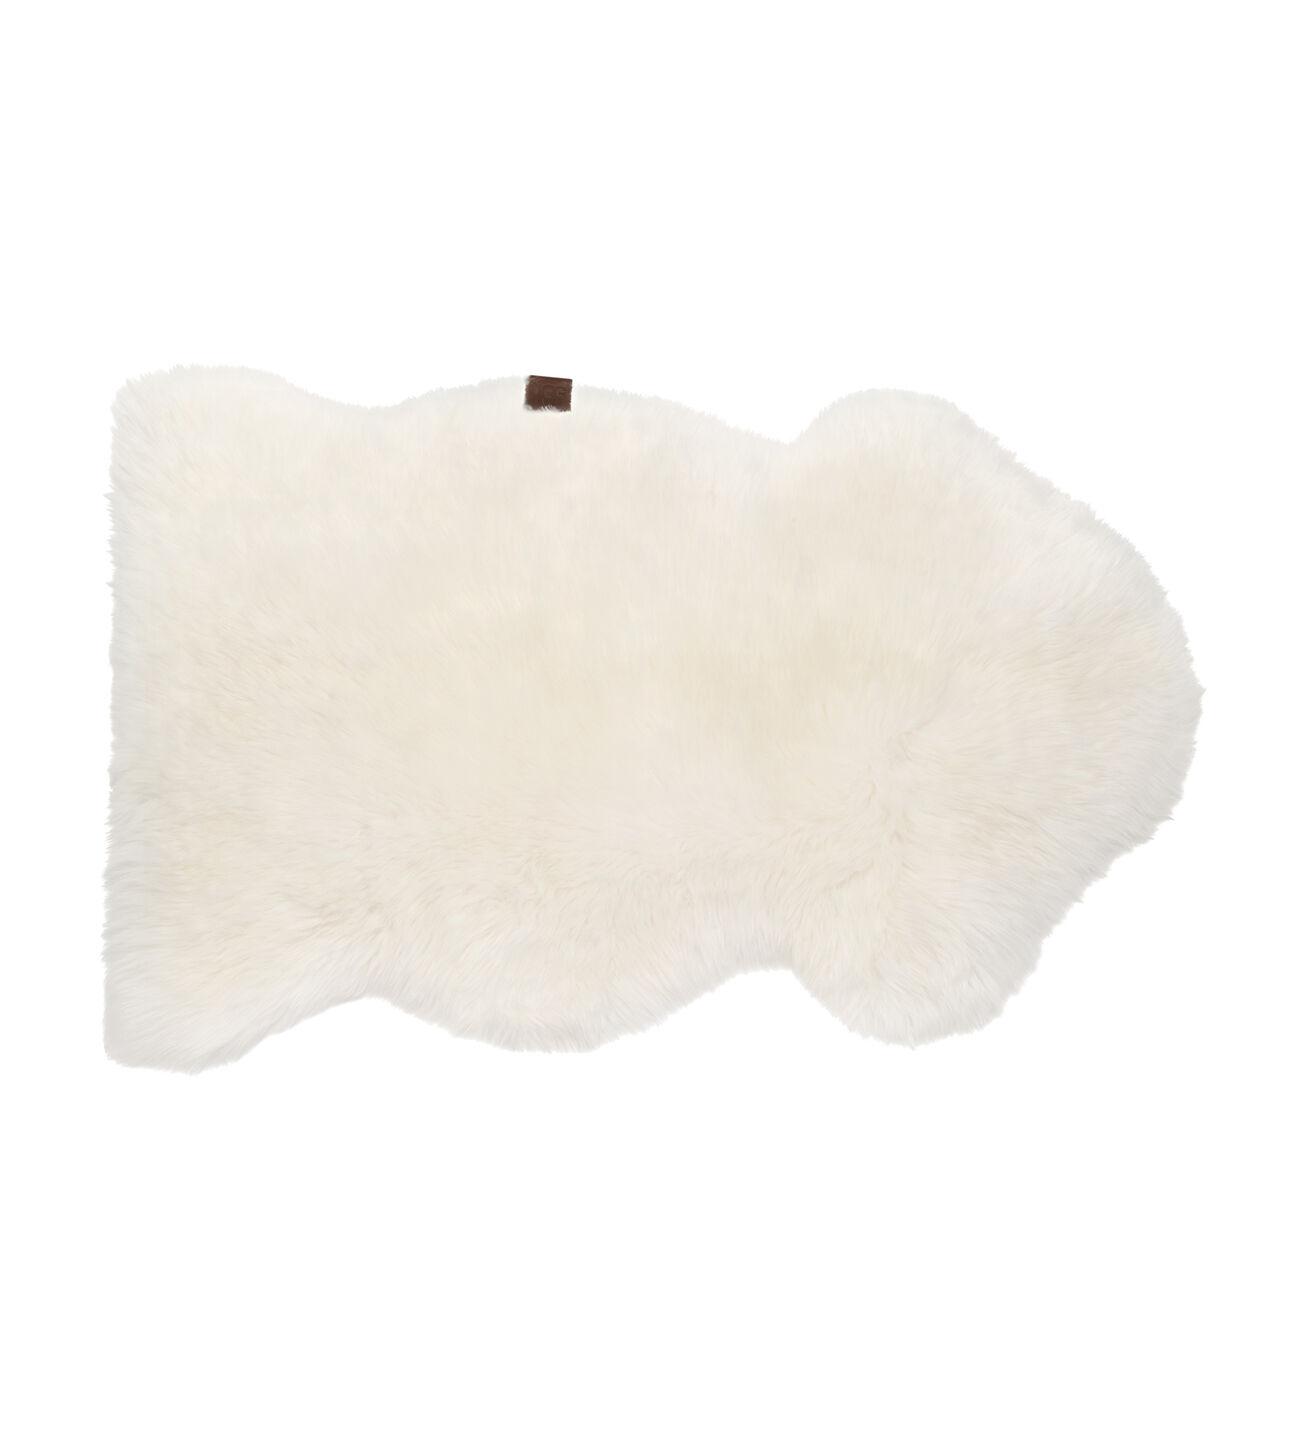 Ugg 174 Sheepskin Area Rug Single Free Shipping On Ugg Com